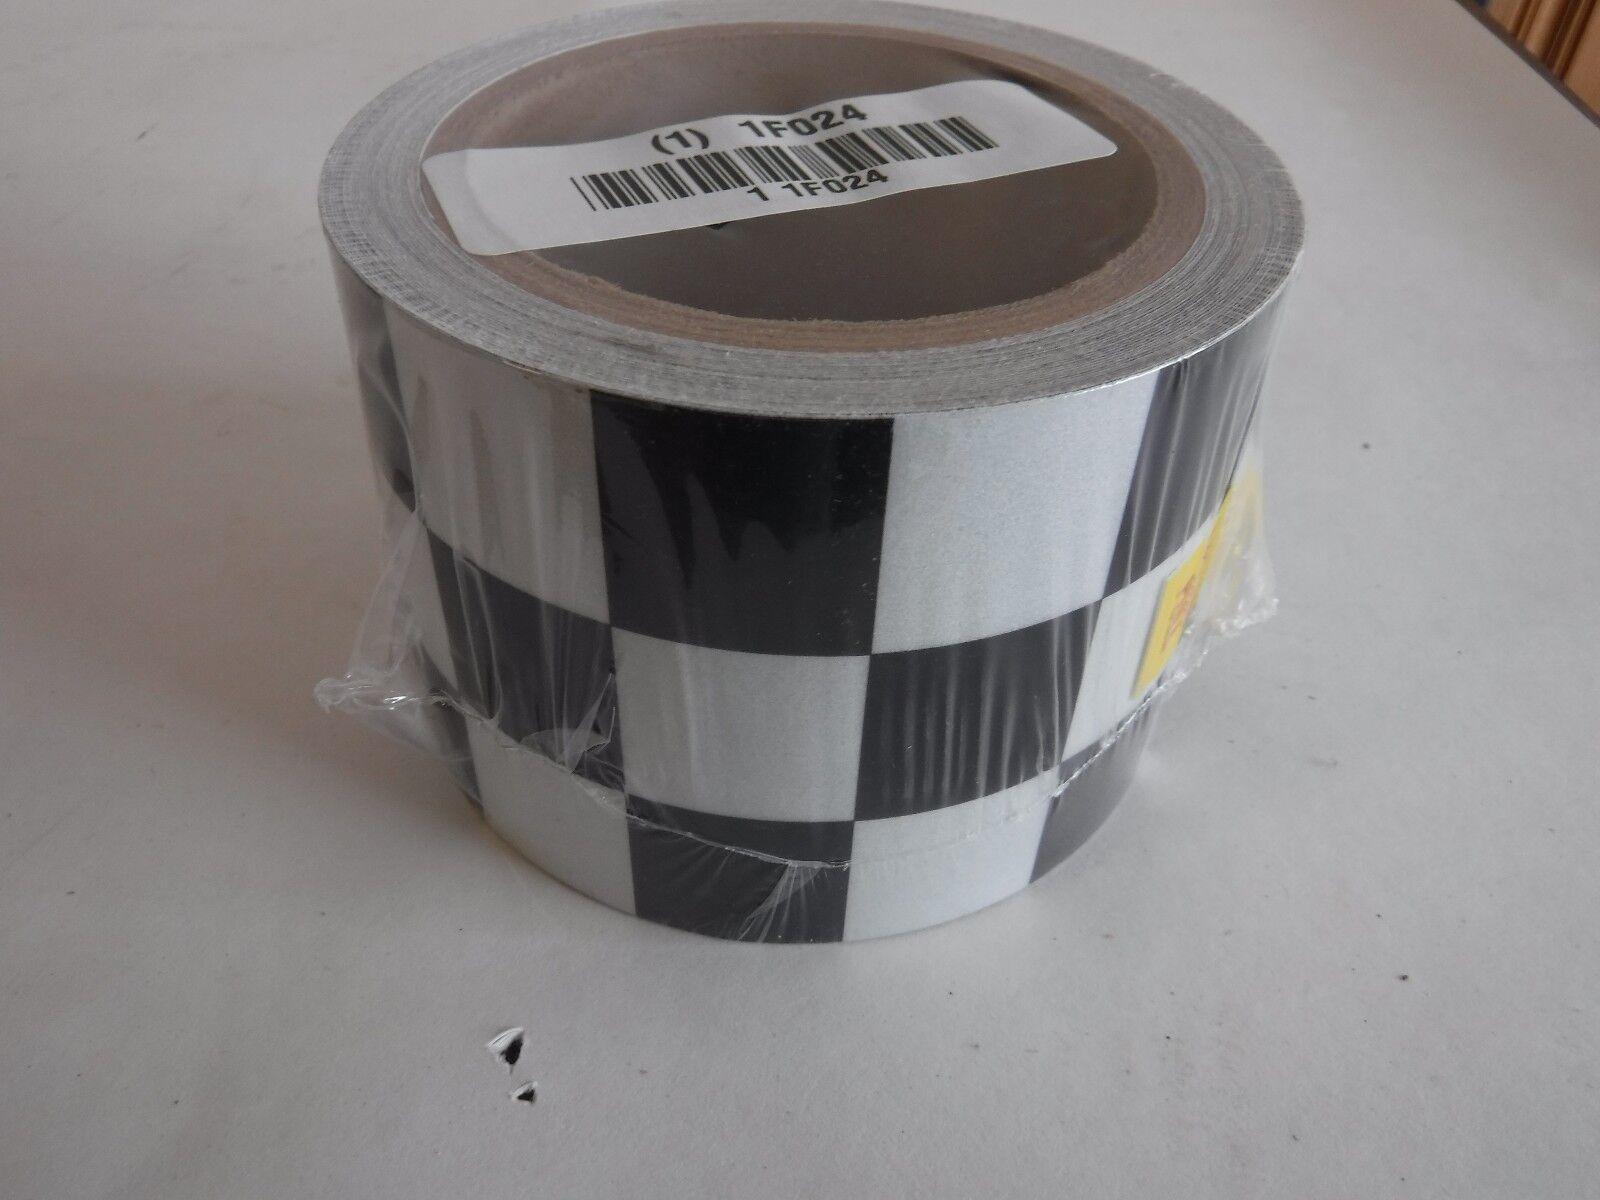 "Black/White Reflective Marking Tape, Brady, 3"" x 30 ft., 1 E"